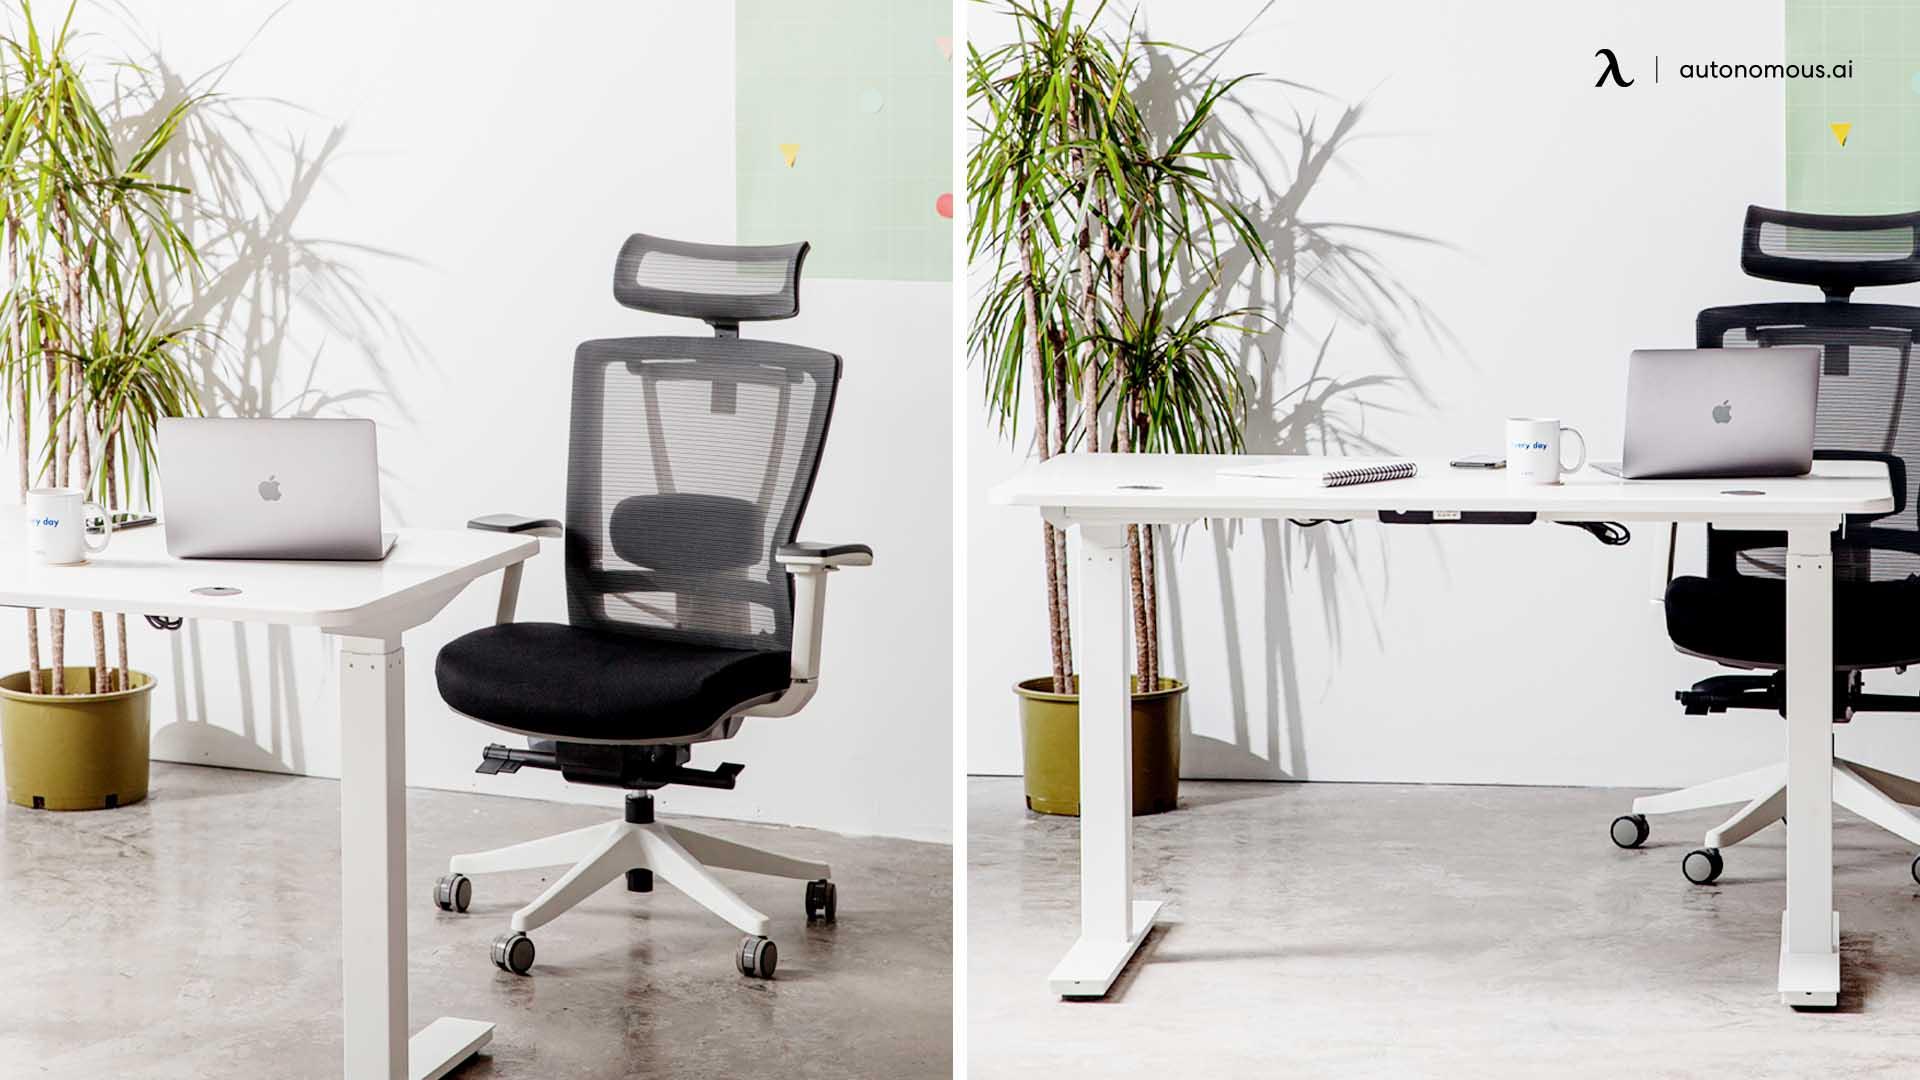 Buy an Ergonomic Chair and a SmartDesk